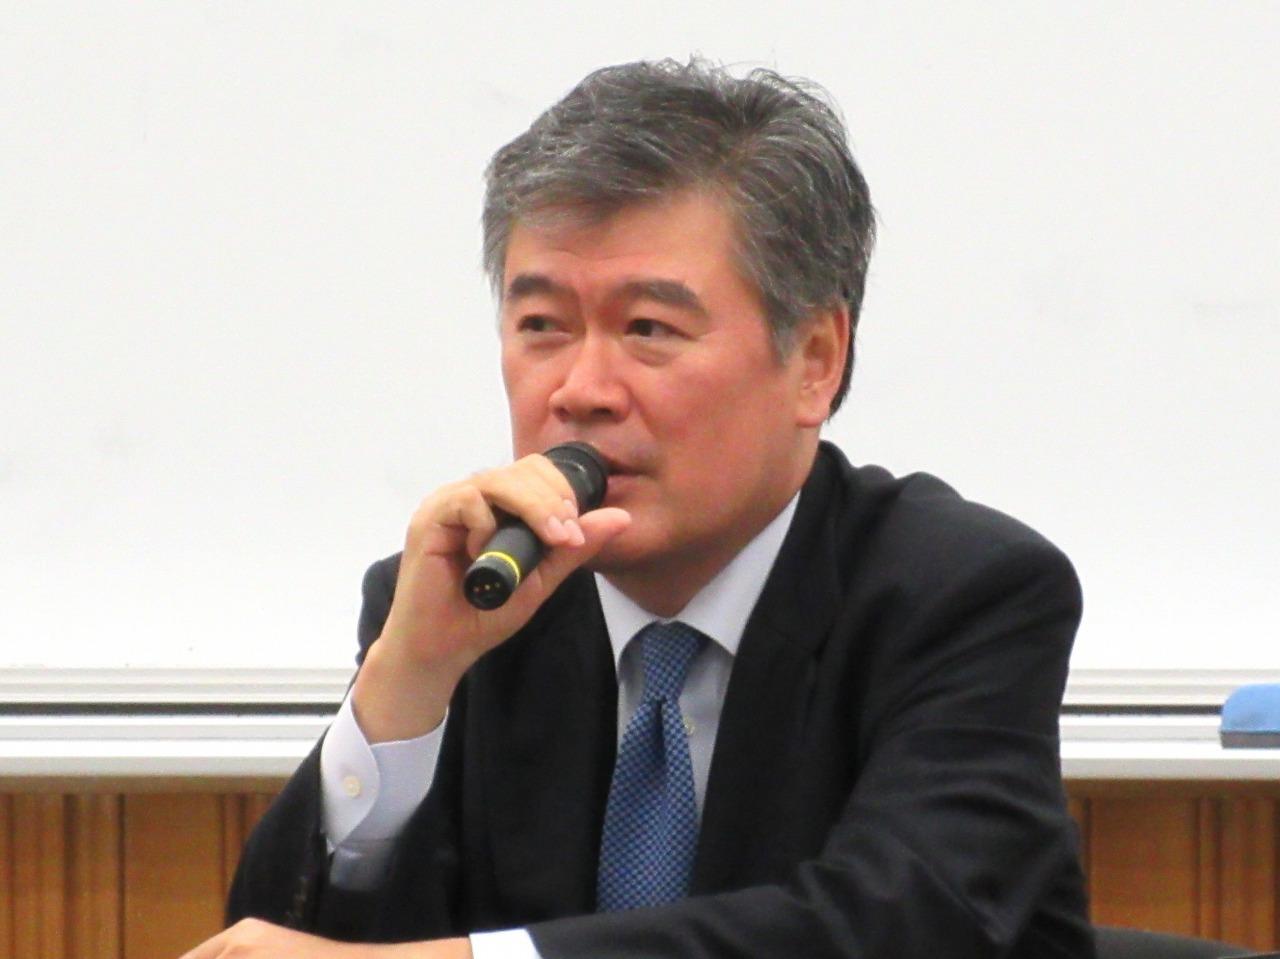 http://www.shinshu-u.ac.jp/faculty/econlaw/topics/images/s-20160601fukuda.jpg